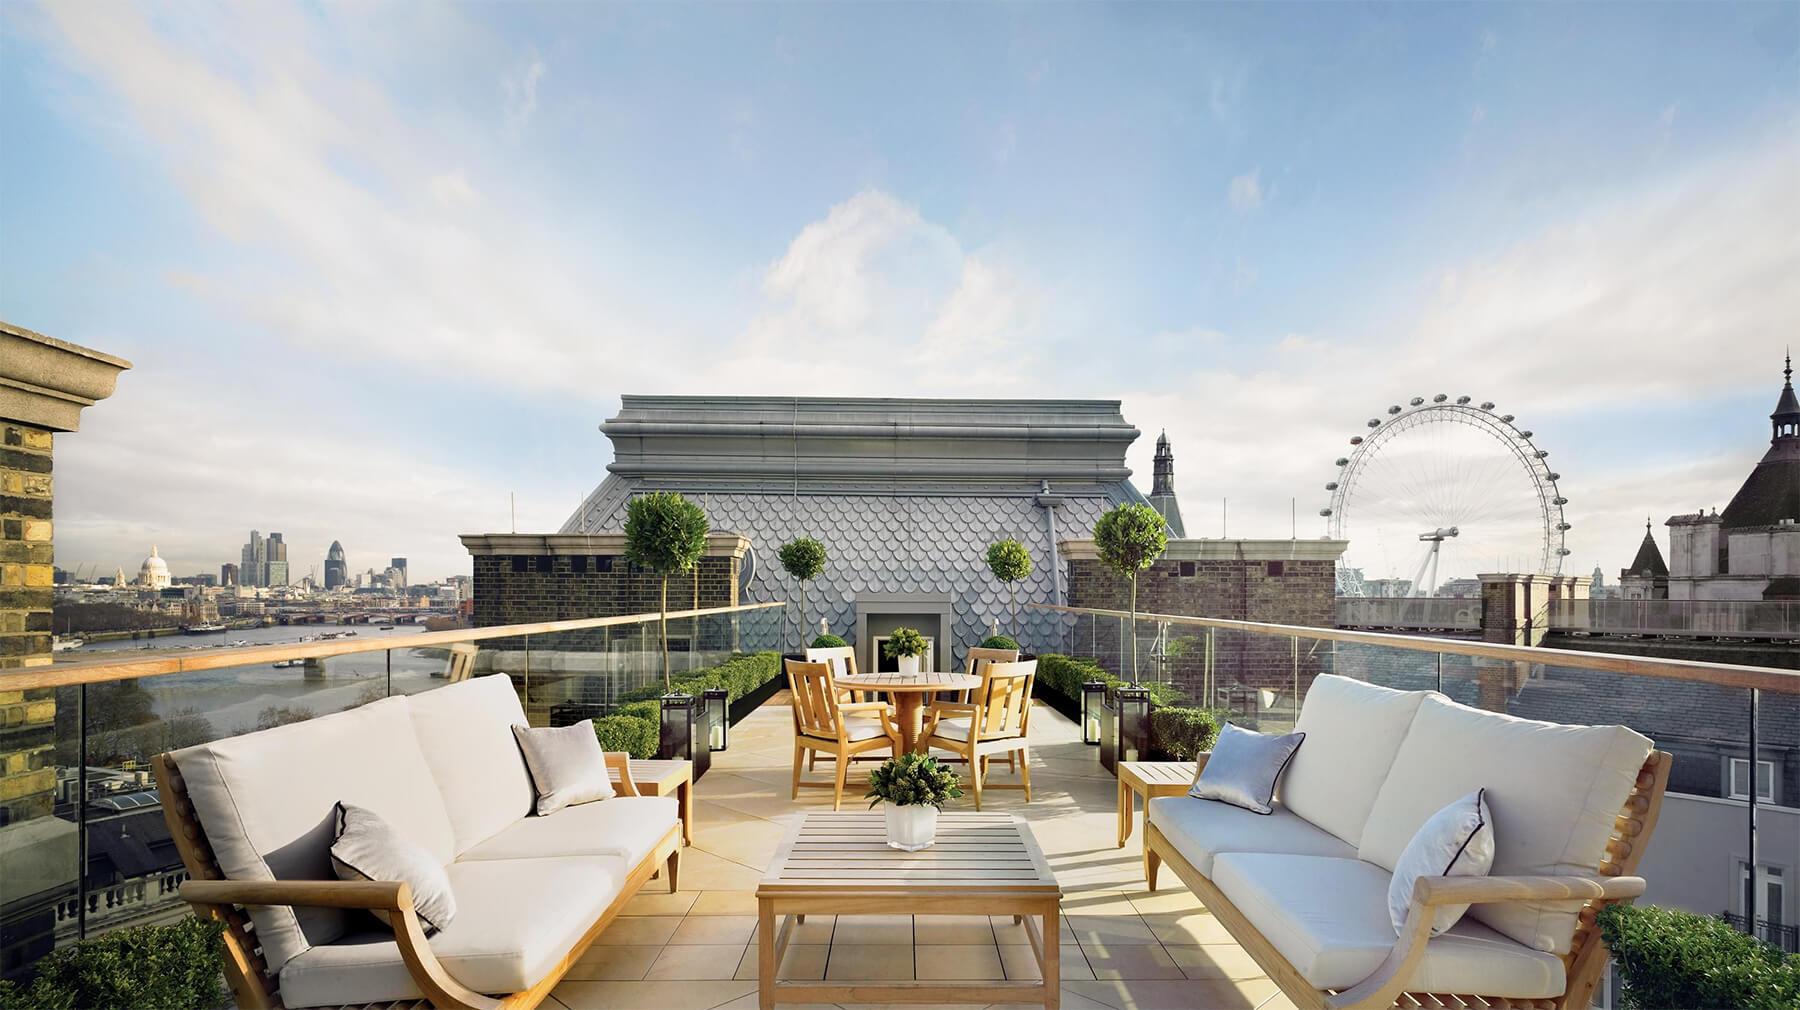 Corinthia Hotel Residences, 10 Whitehall Place, London ...